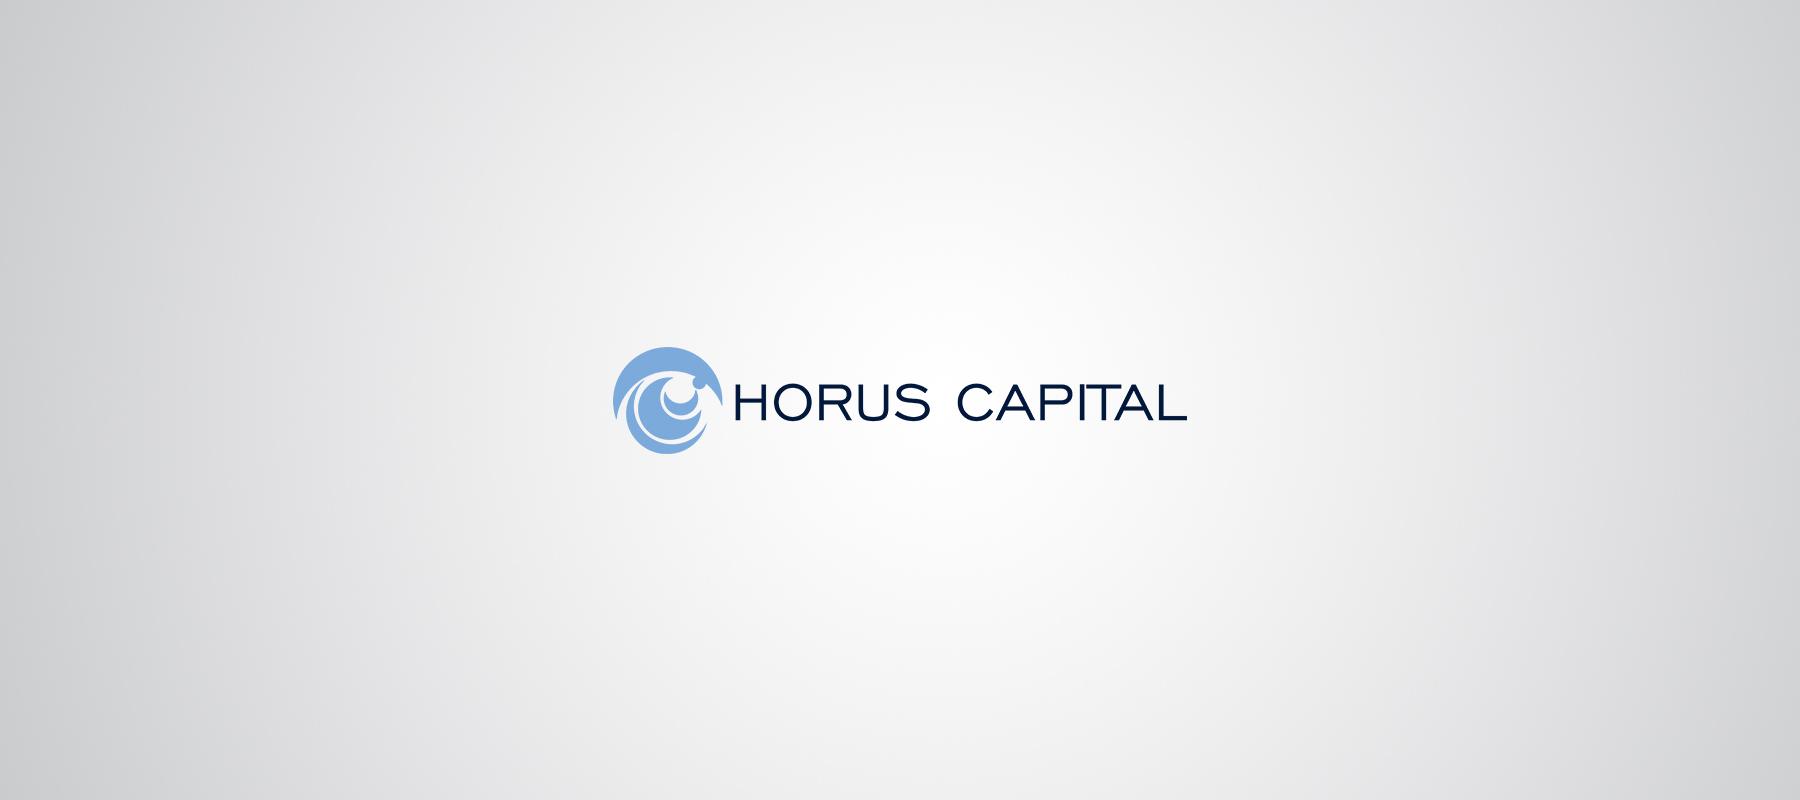 CR_Logos_Horus_1800x800_work.jpg